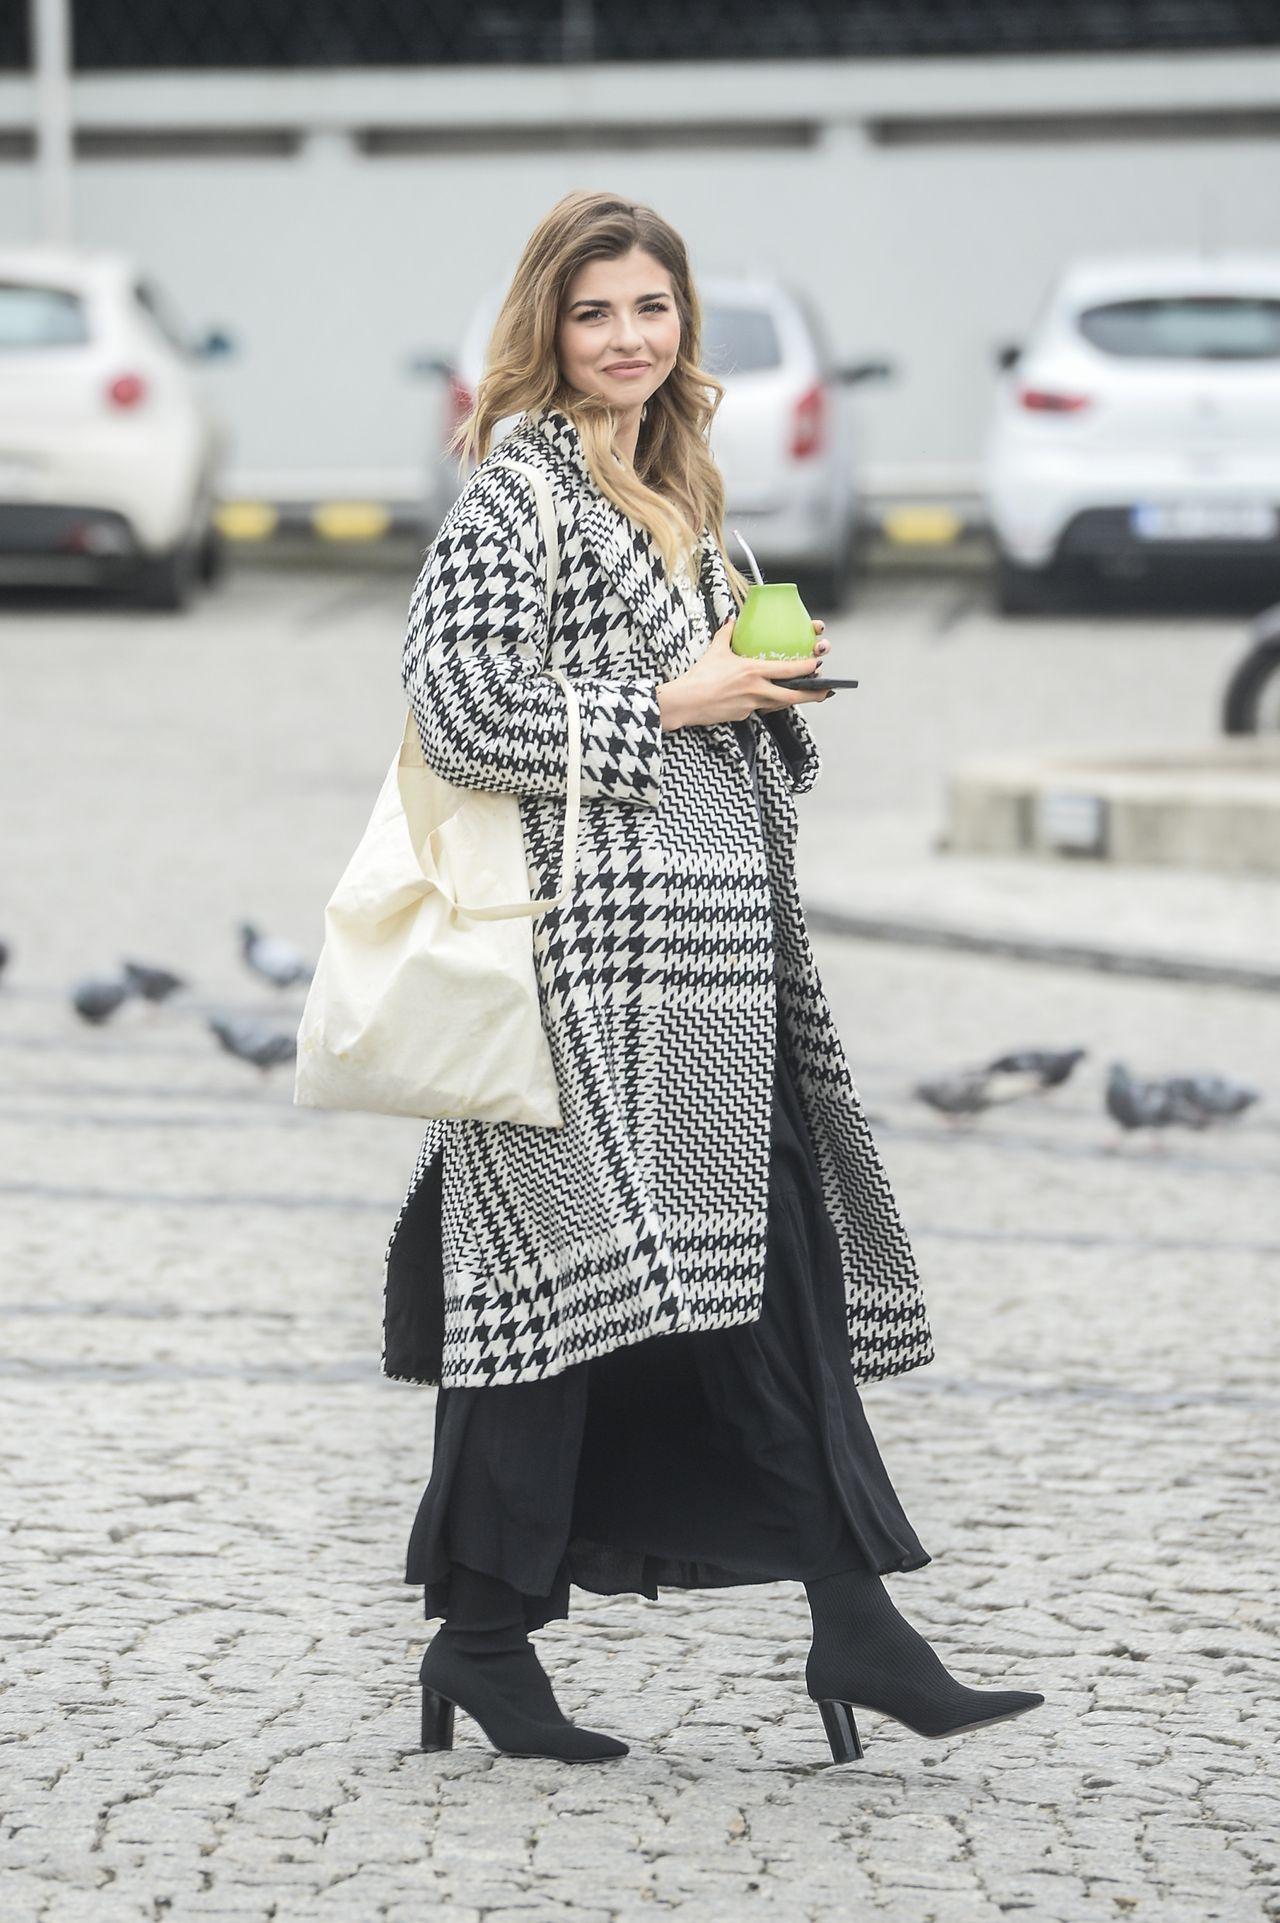 Agnieszka Dziekan